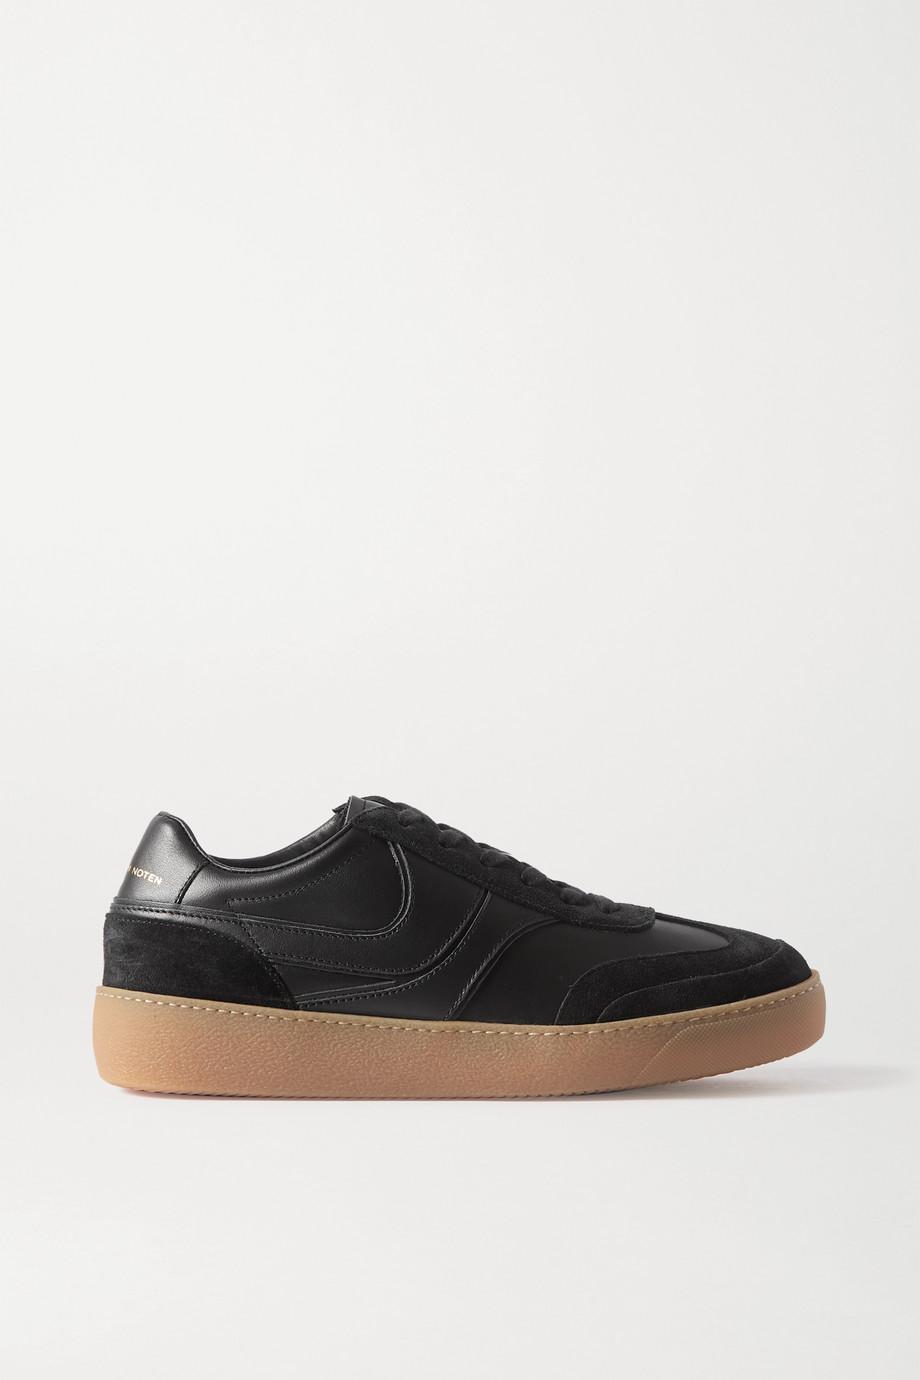 Dries Van Noten Leather and suede sneakers